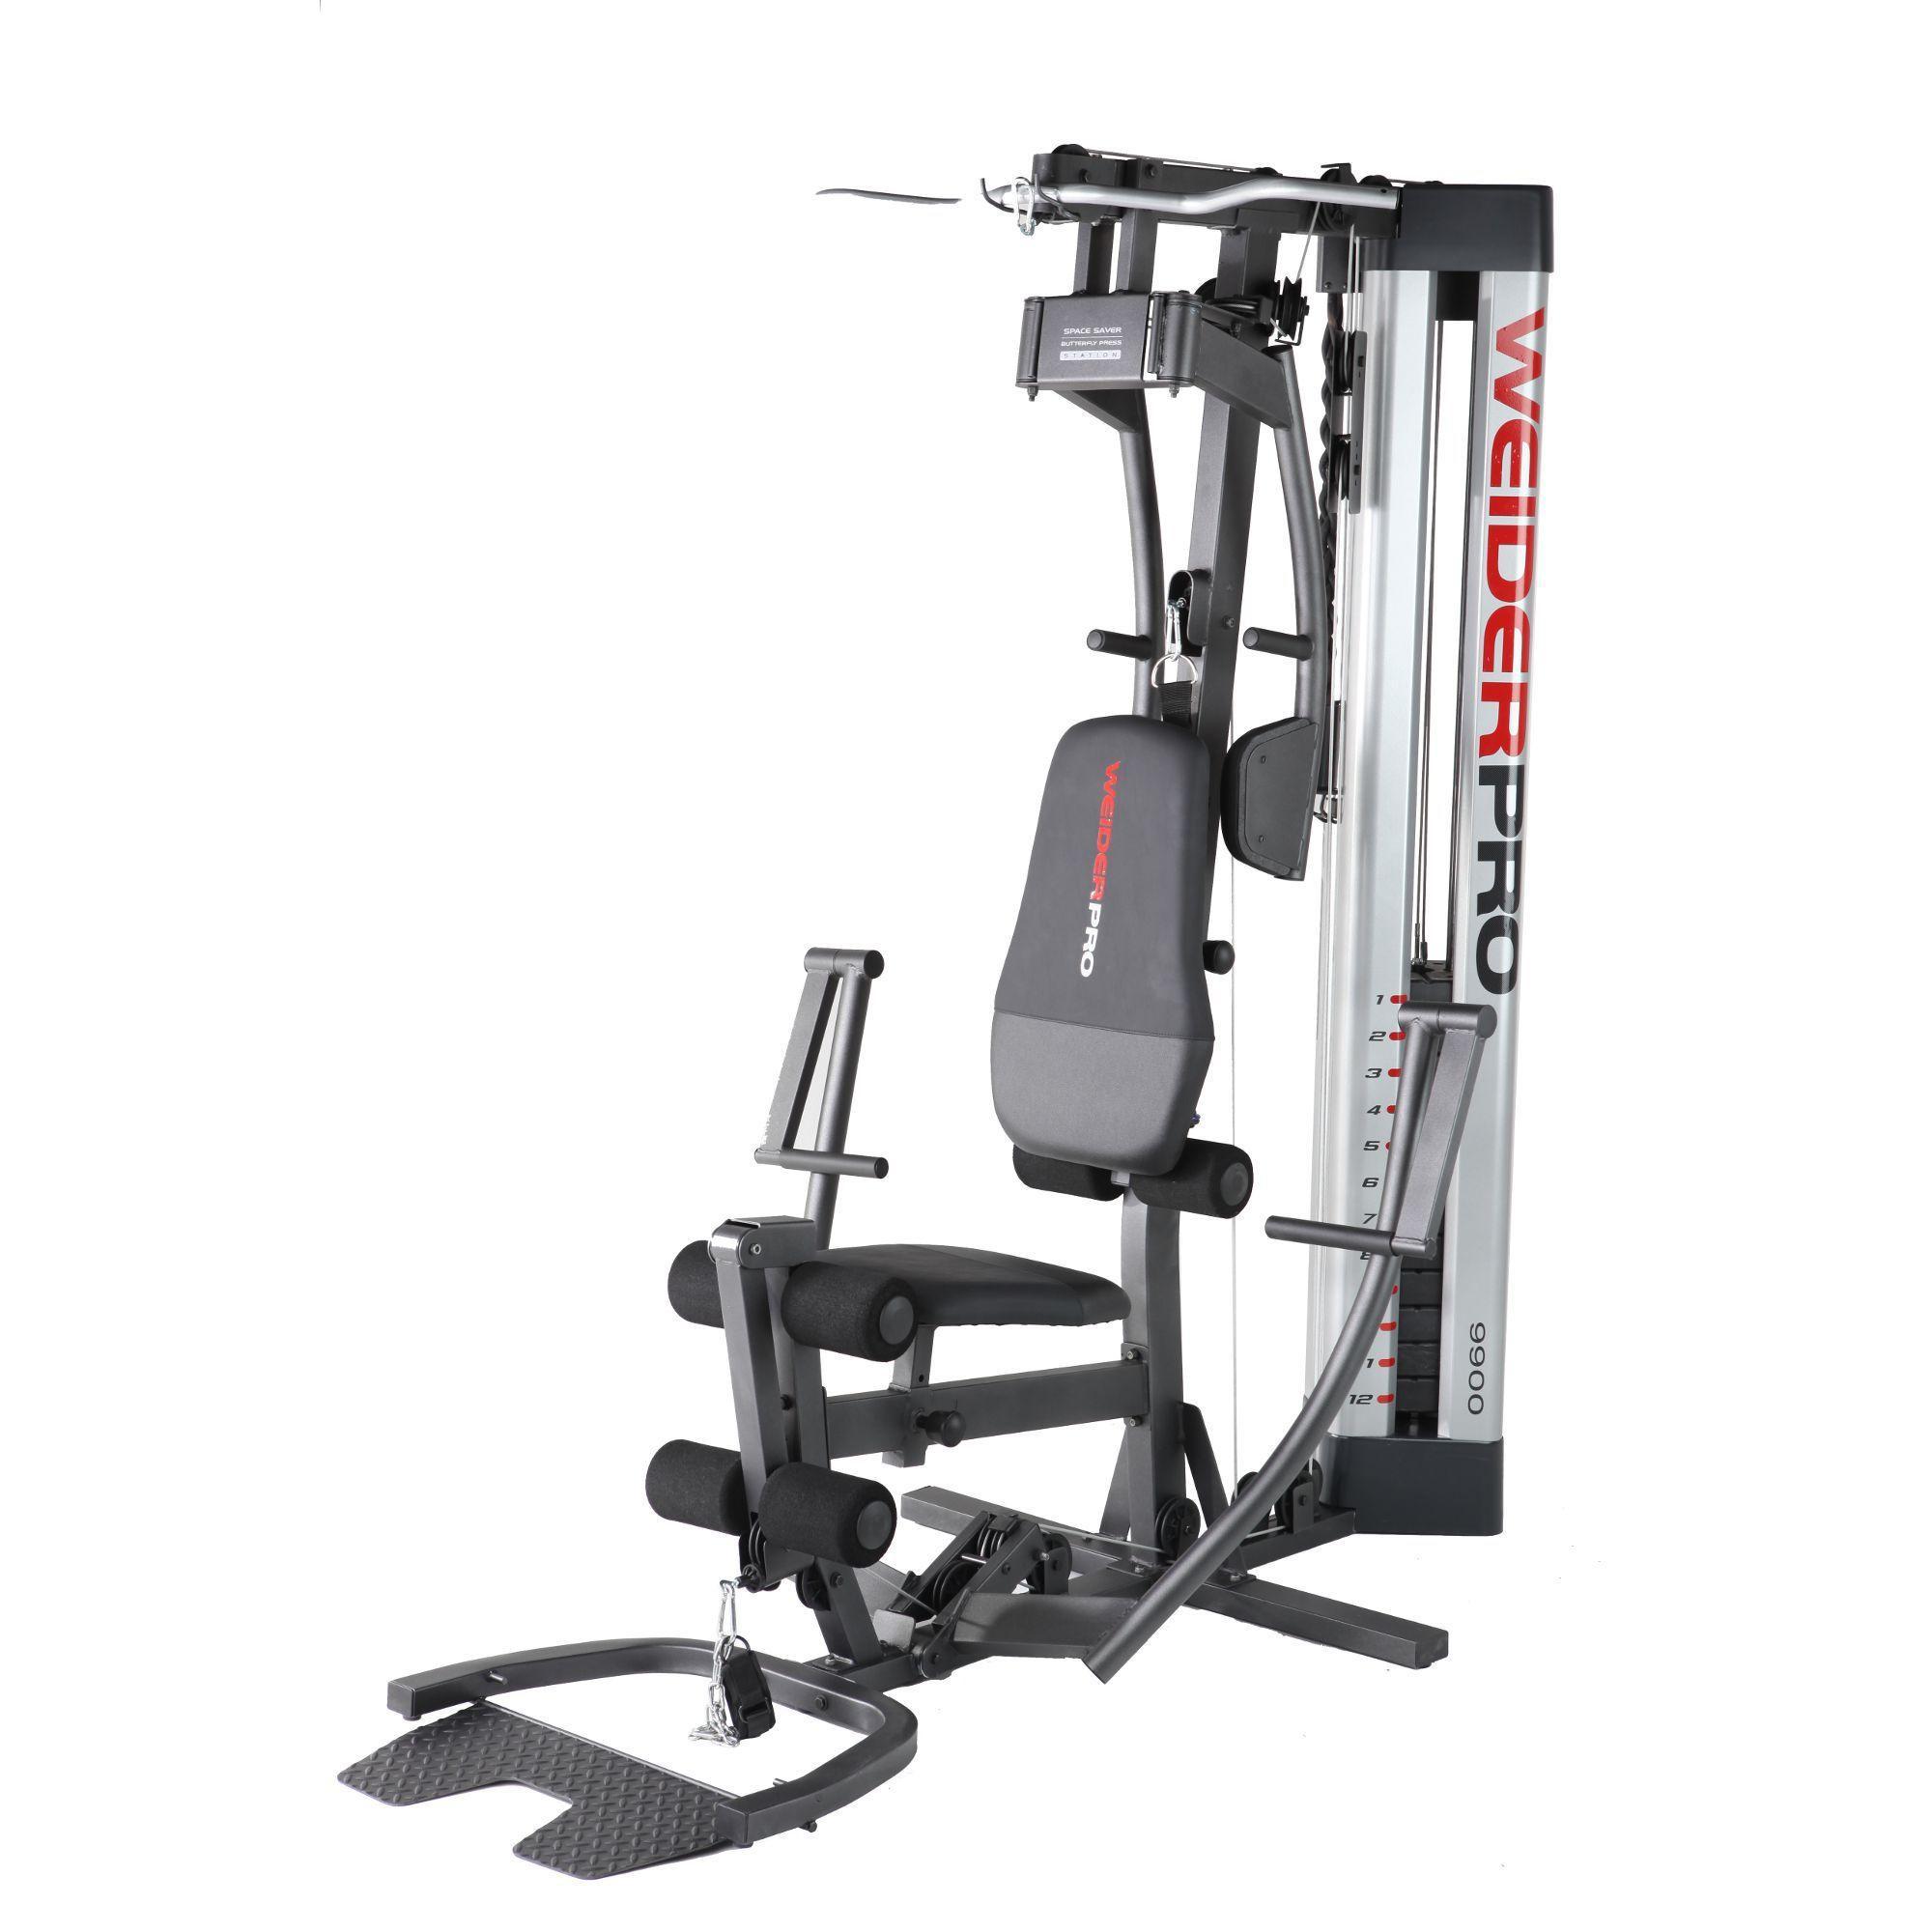 Мультистанция Weider 9900 I жим от плеч верхняя тяга spirit fitness dws103 u2